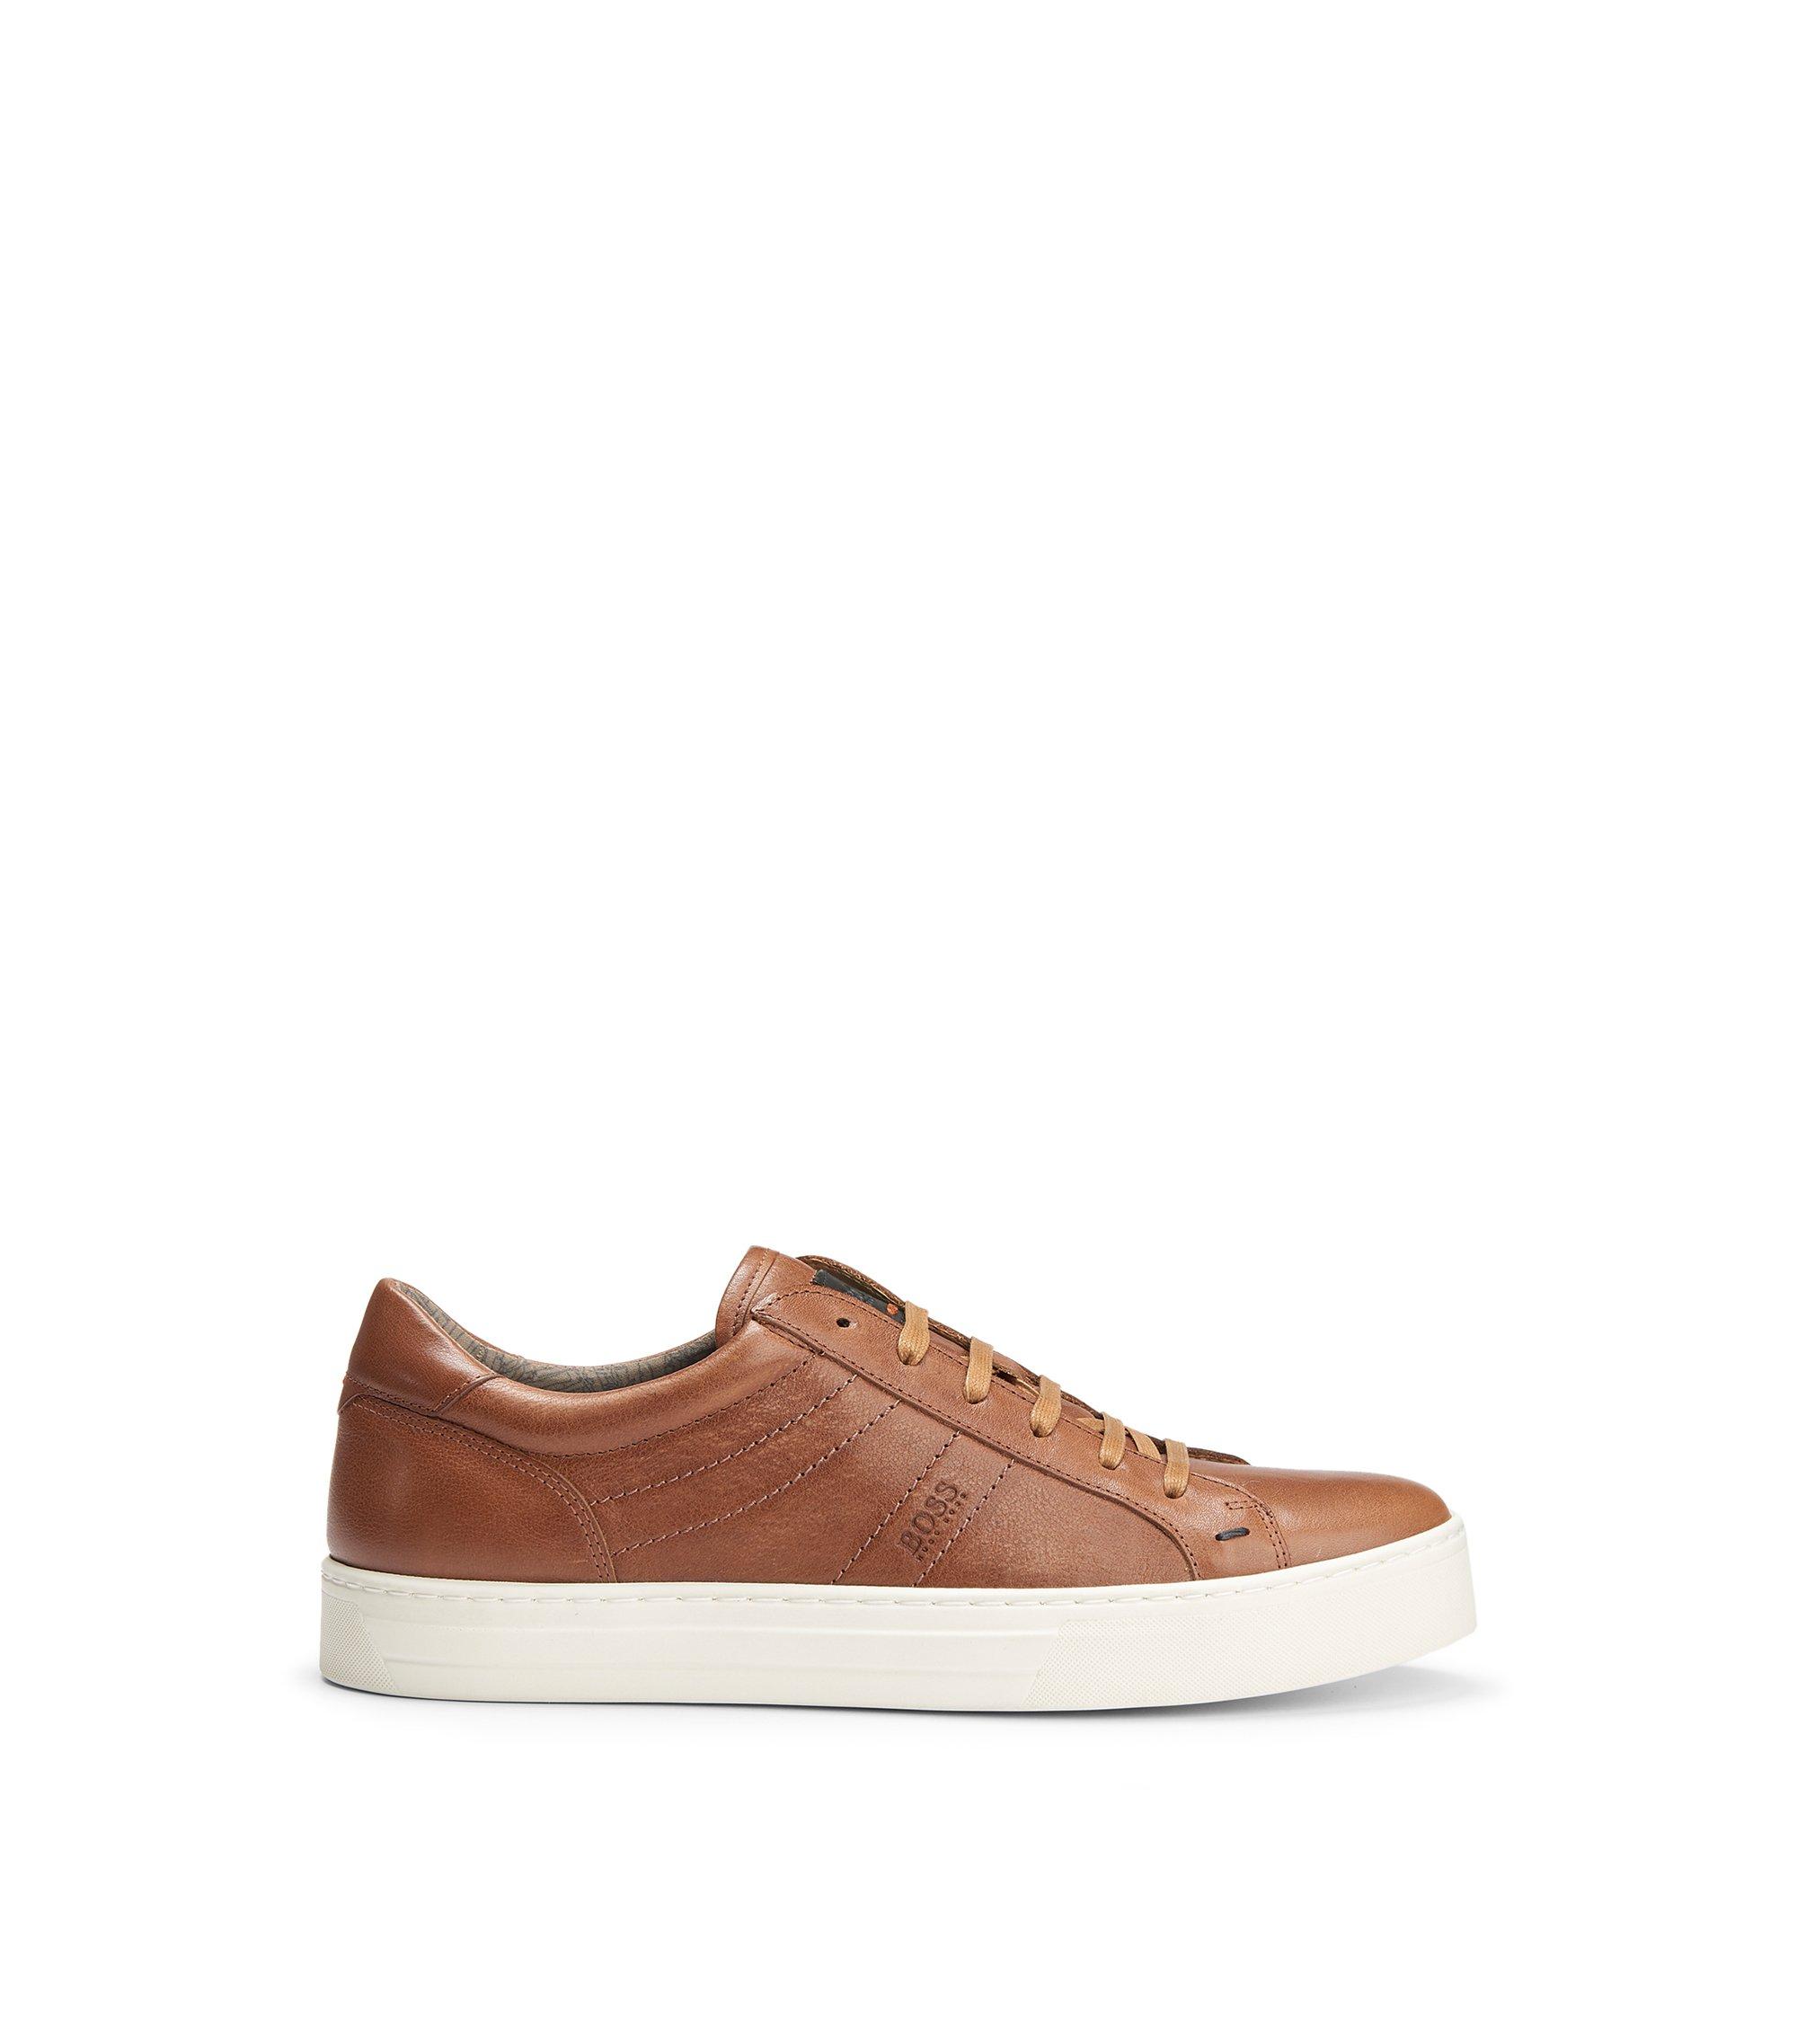 Calfskin Vintage Sneaker | Noir Tenn Itws, Brown